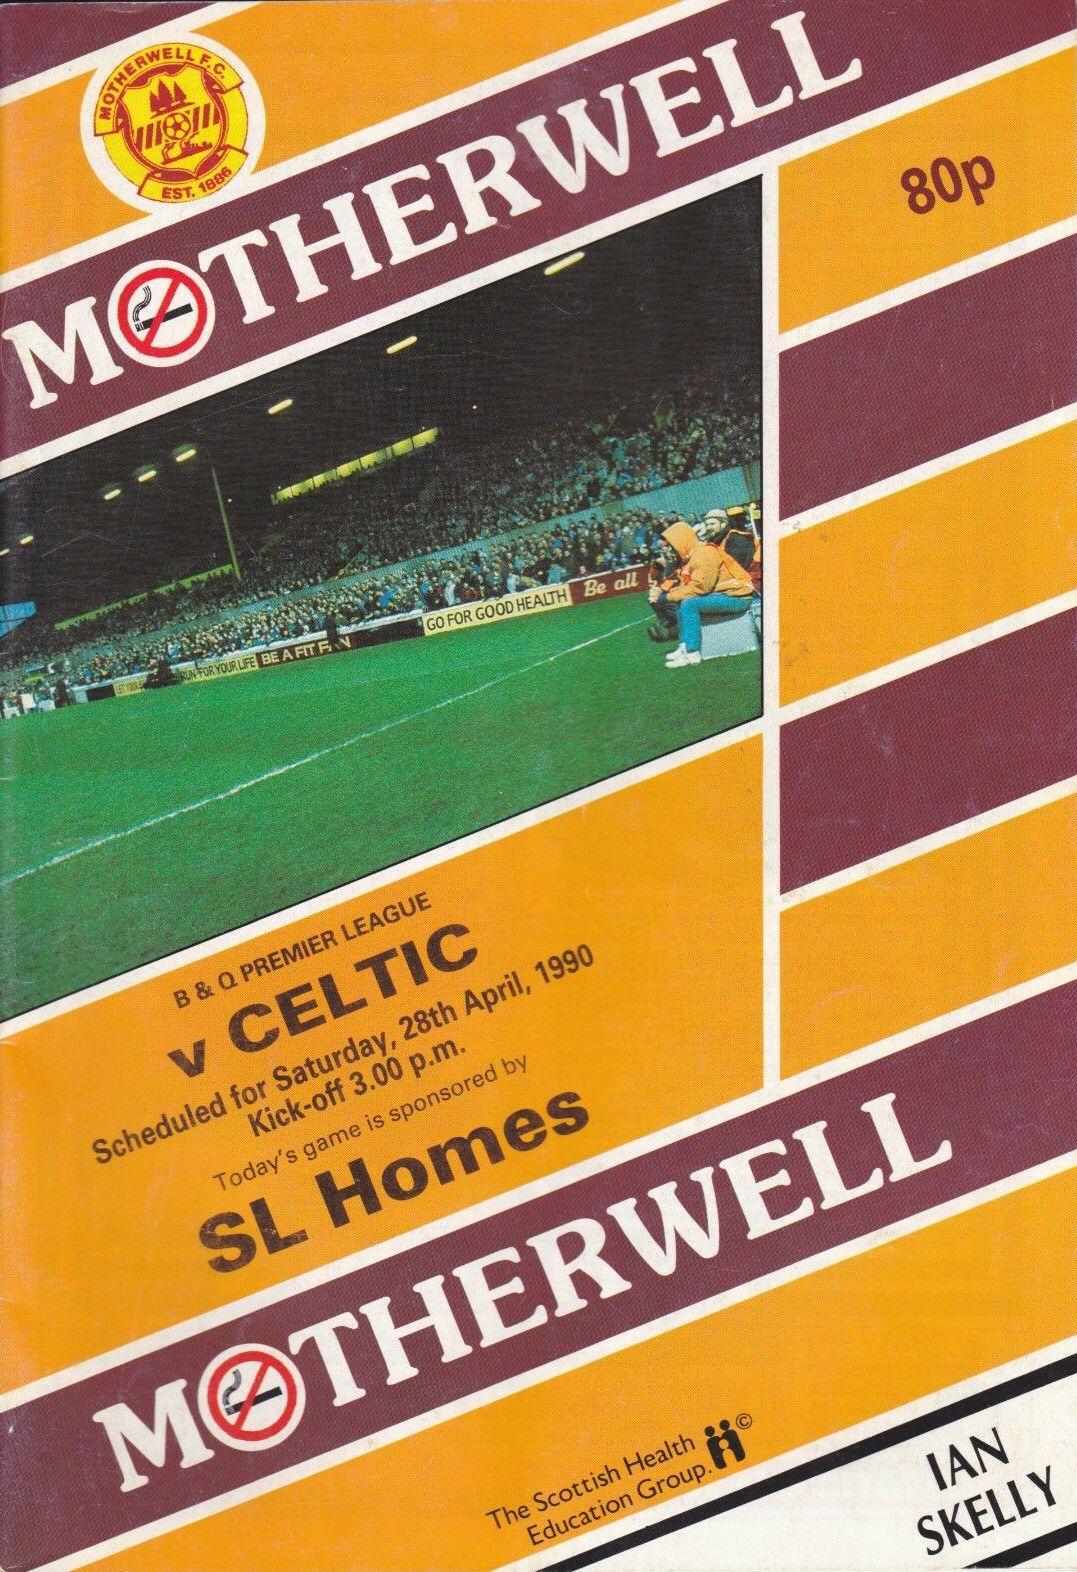 versus Celtic Programme Cover